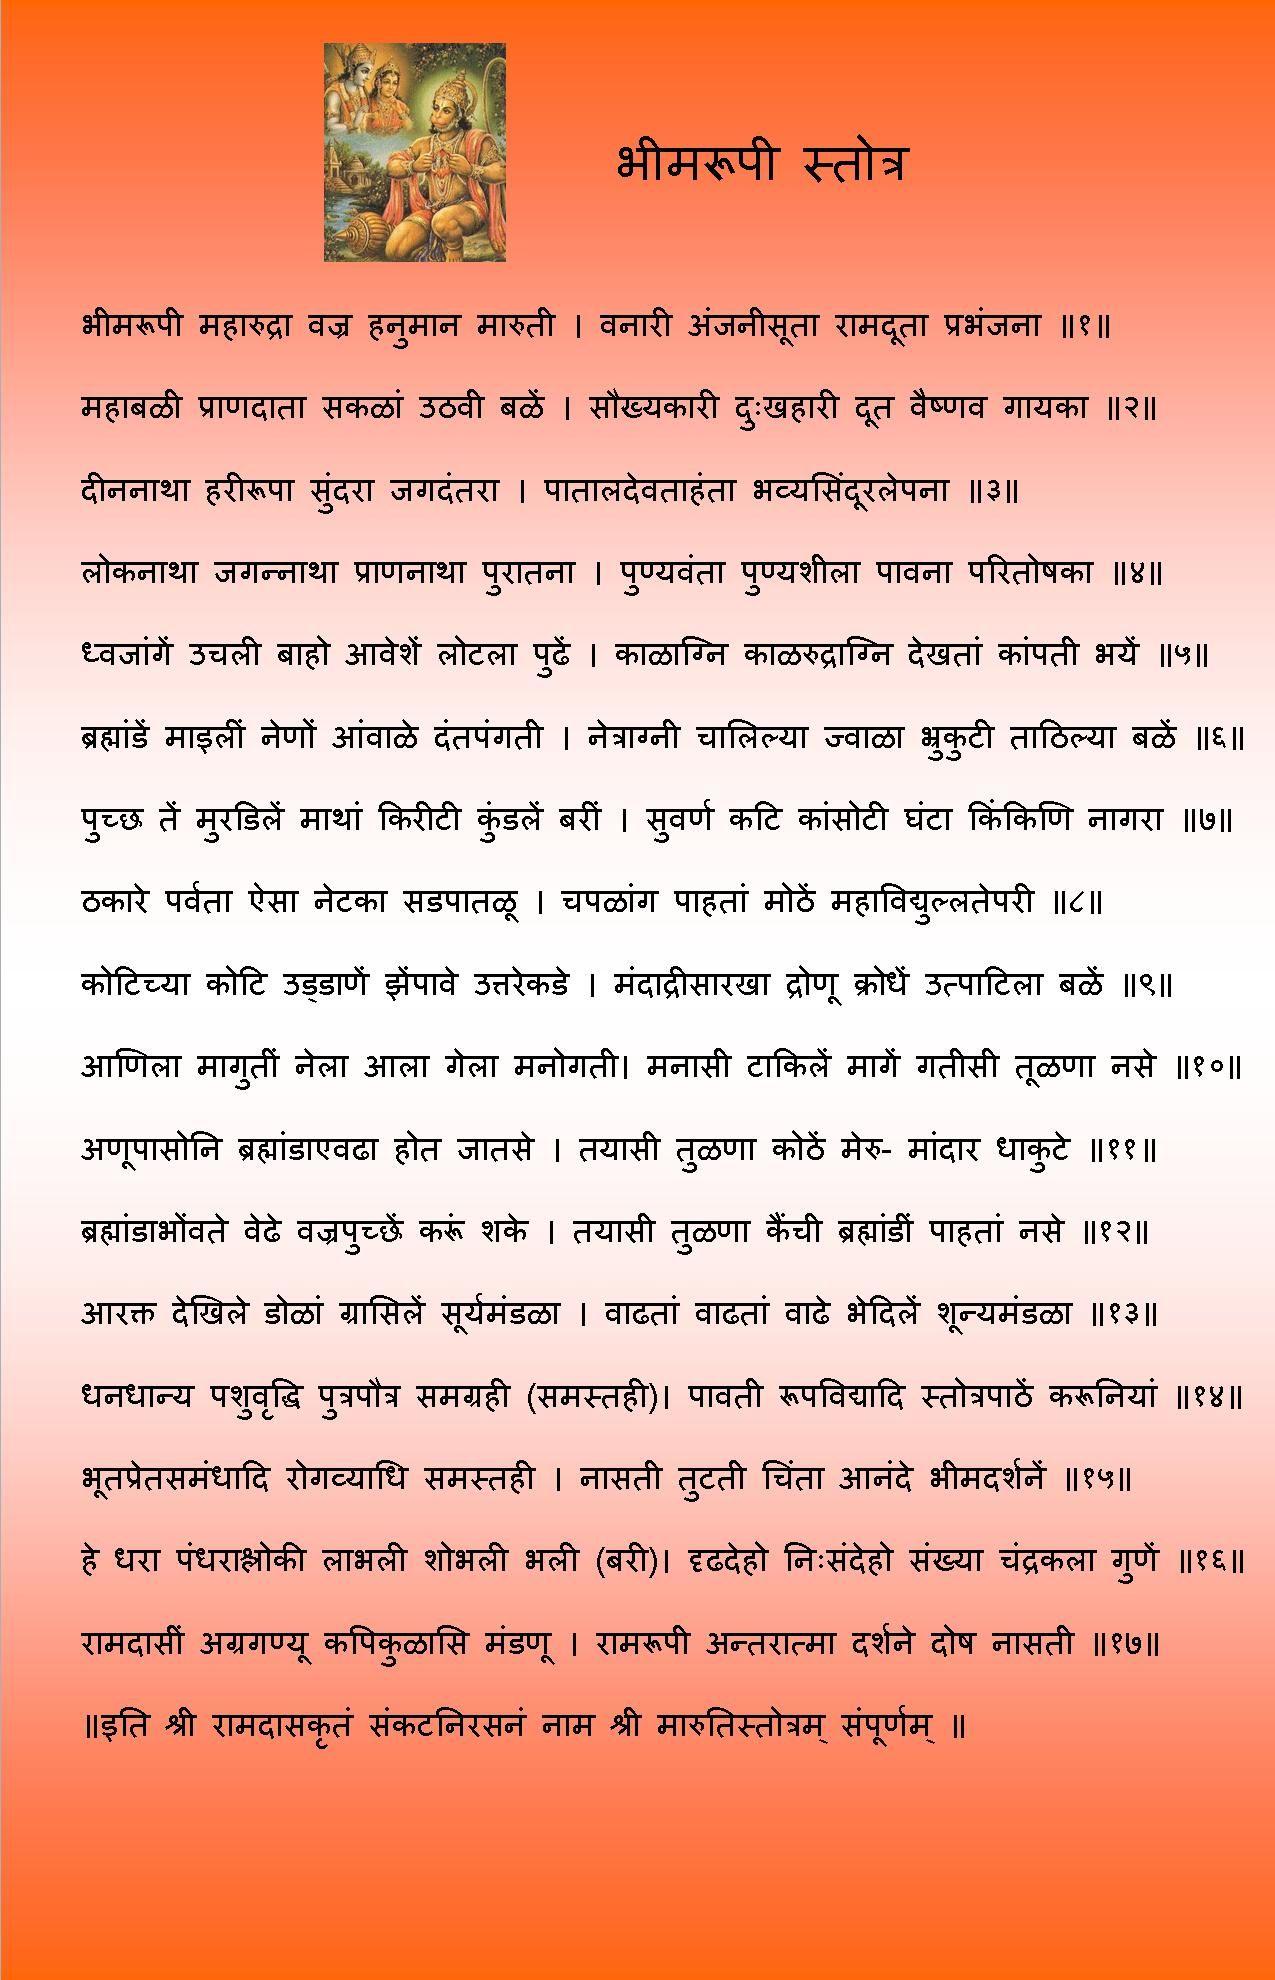 Image Result For Maruti Stotra In Marathi Pdf Neon Light Wallpaper Shivaji Maharaj Hd Wallpaper Mantras